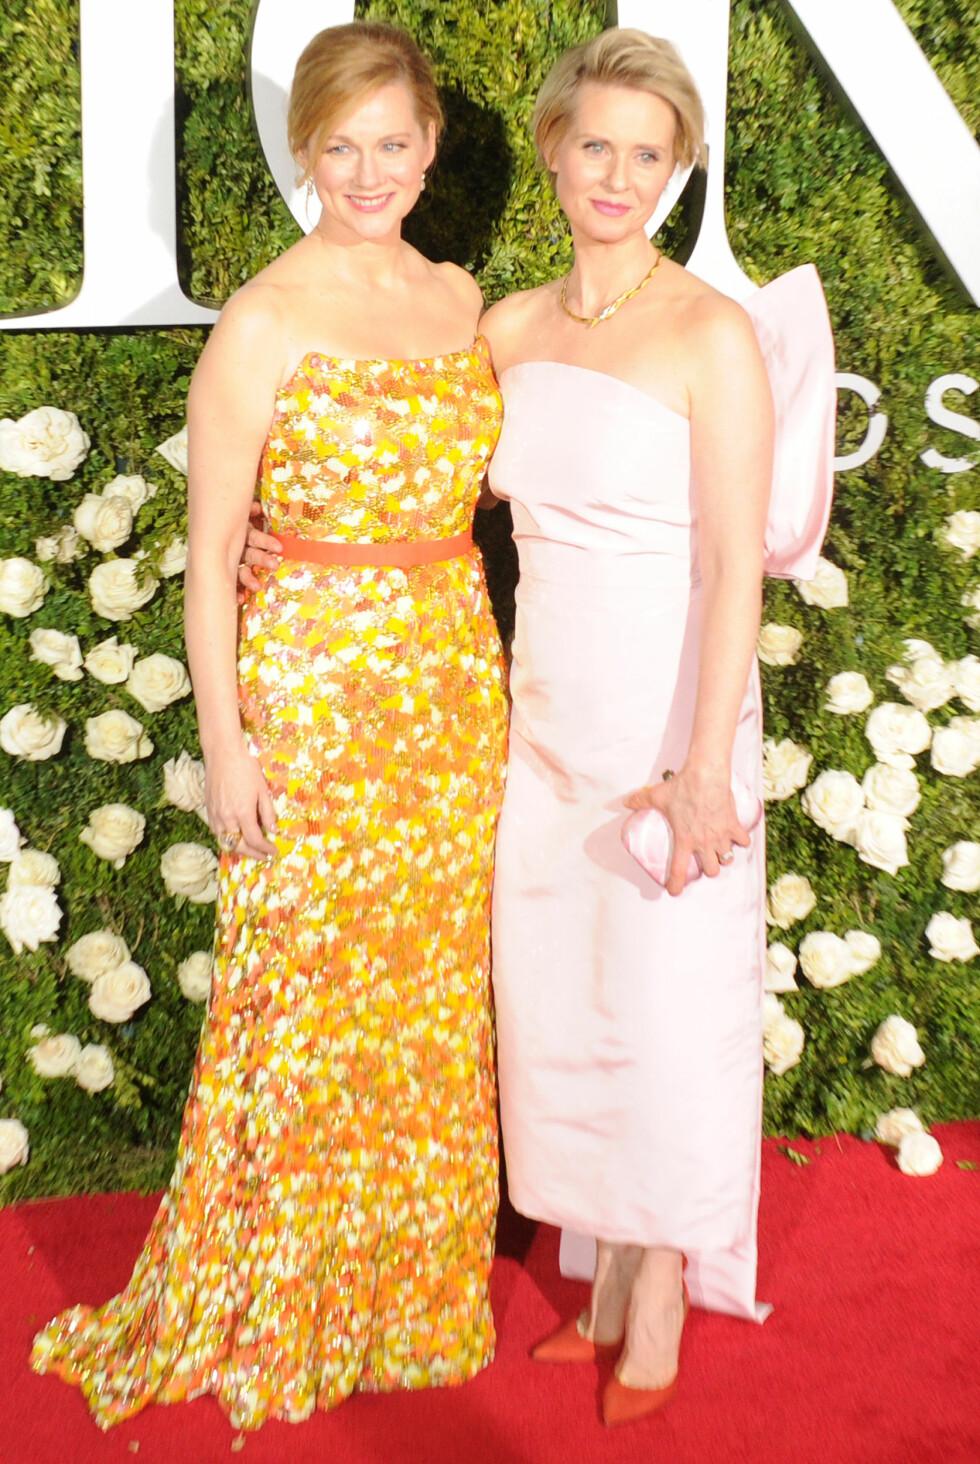 TONY AWARDS: Skuespillerne Laura Linney og Cynthia Nixon i sommerlige antrekk. Foto: NTB Scanpix